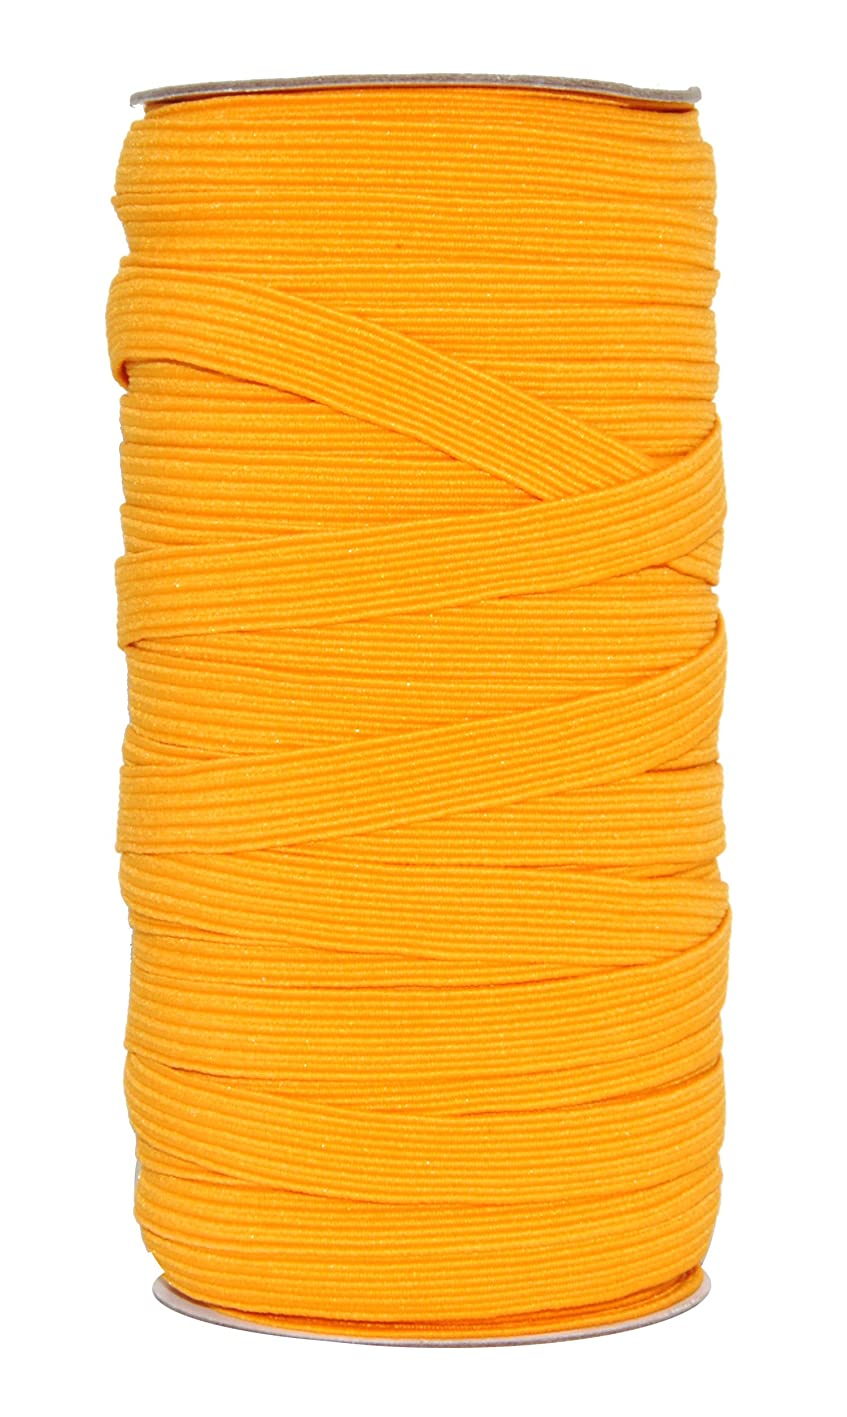 Mandala Crafts Flat Elastic Band, Braided Stretch Strap Cord Roll for Sewing and Crafting (3/8 Inch 10mm 50 Yards, Gold) xgaacsbprdl413